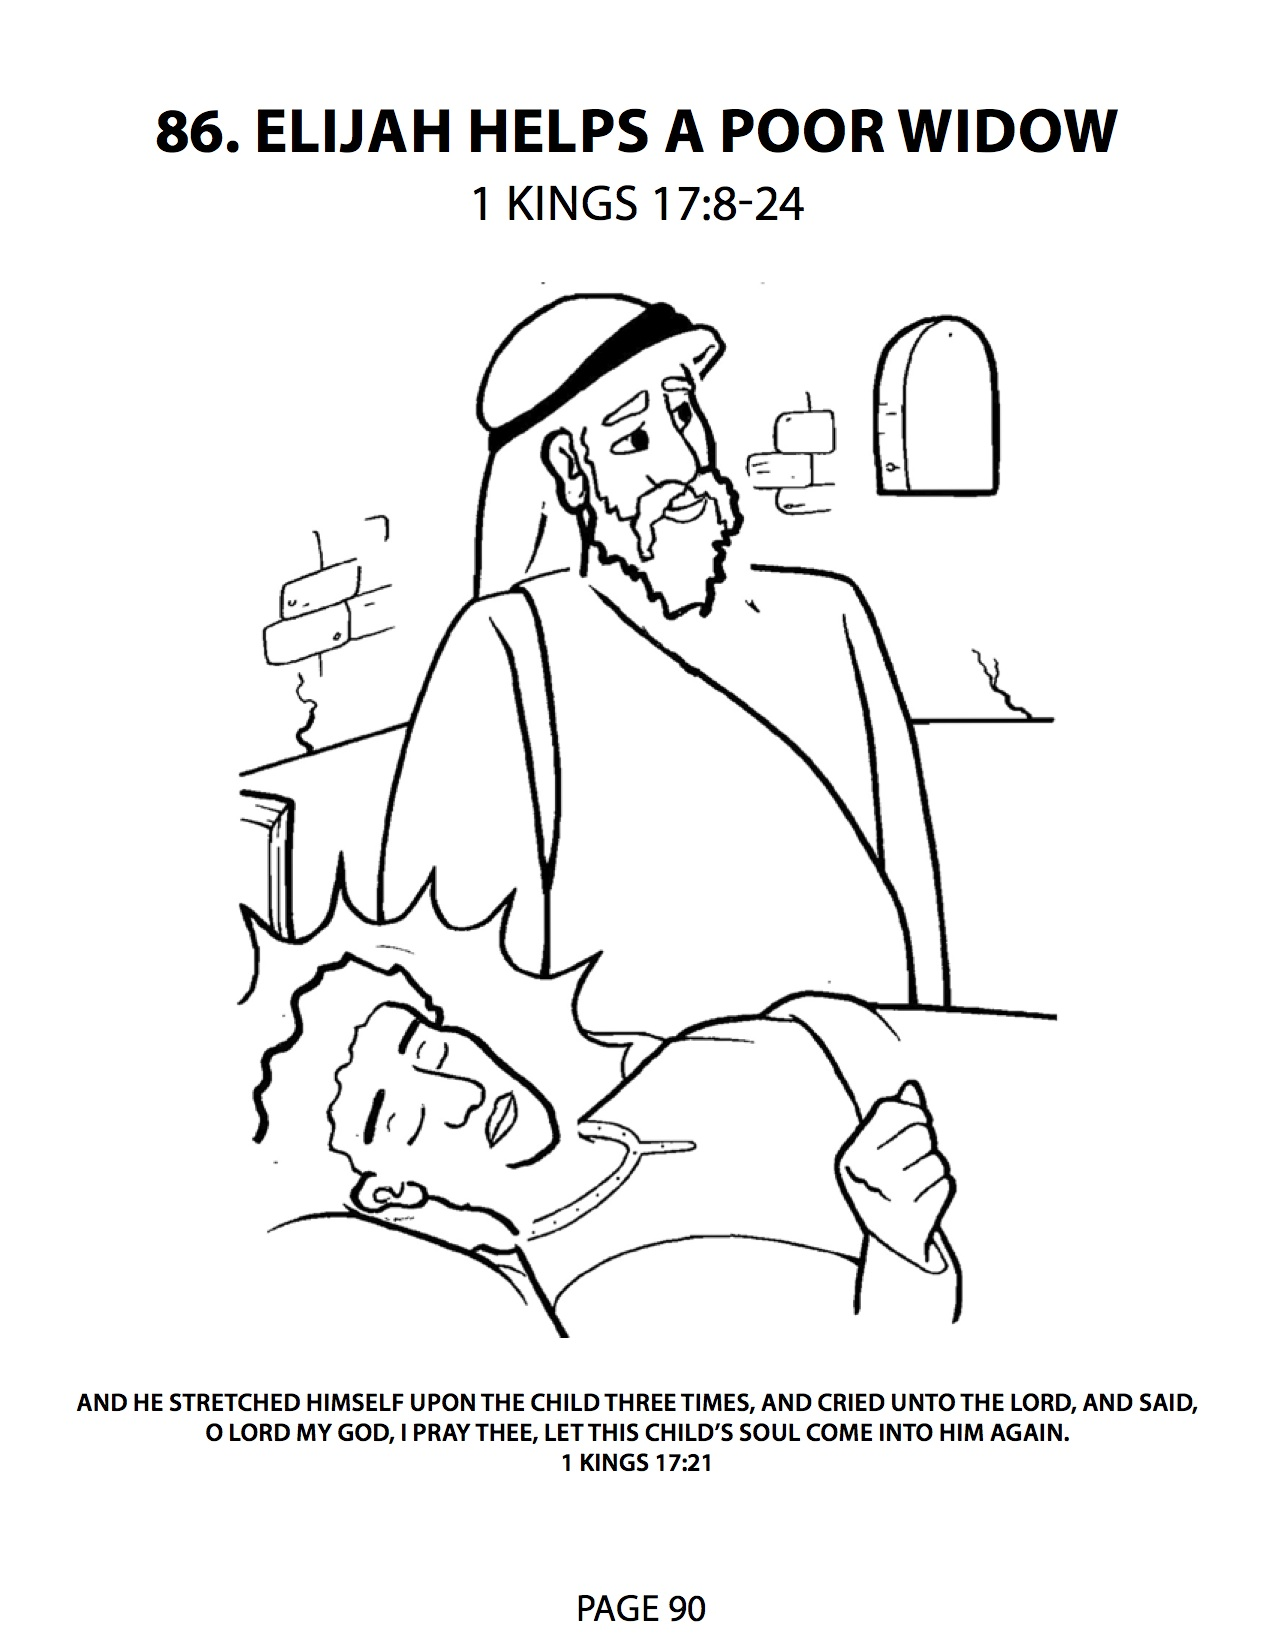 1275x1650 Monumental Elisha Helps A Widow Coloring Page Elijah And The Help